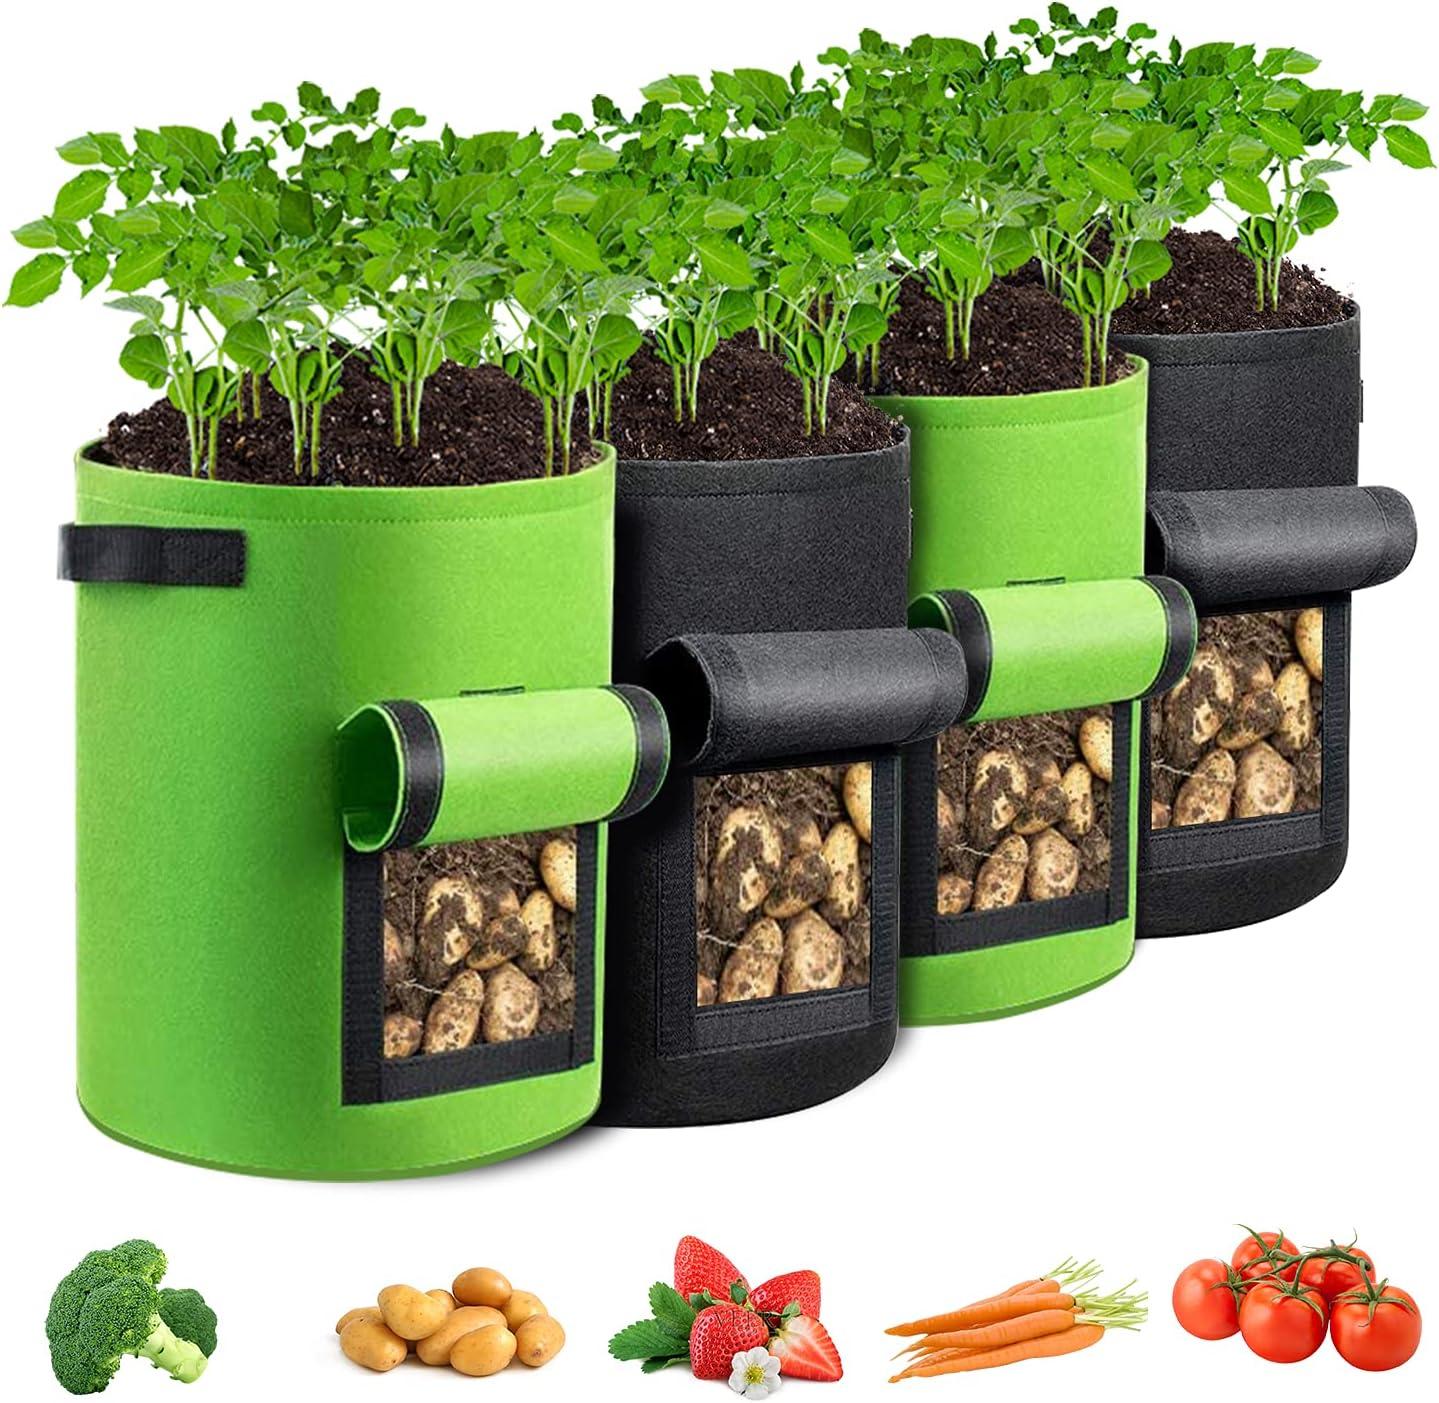 GORDITA Grow Bags- 4 Pack Potato Grow Bags with Flap- 10 Gallon Potato Planter Bags- Fabric Pot Bags with Handles- Garden Planter Bags with Harvest Window for Potato Tomato and Vegetables